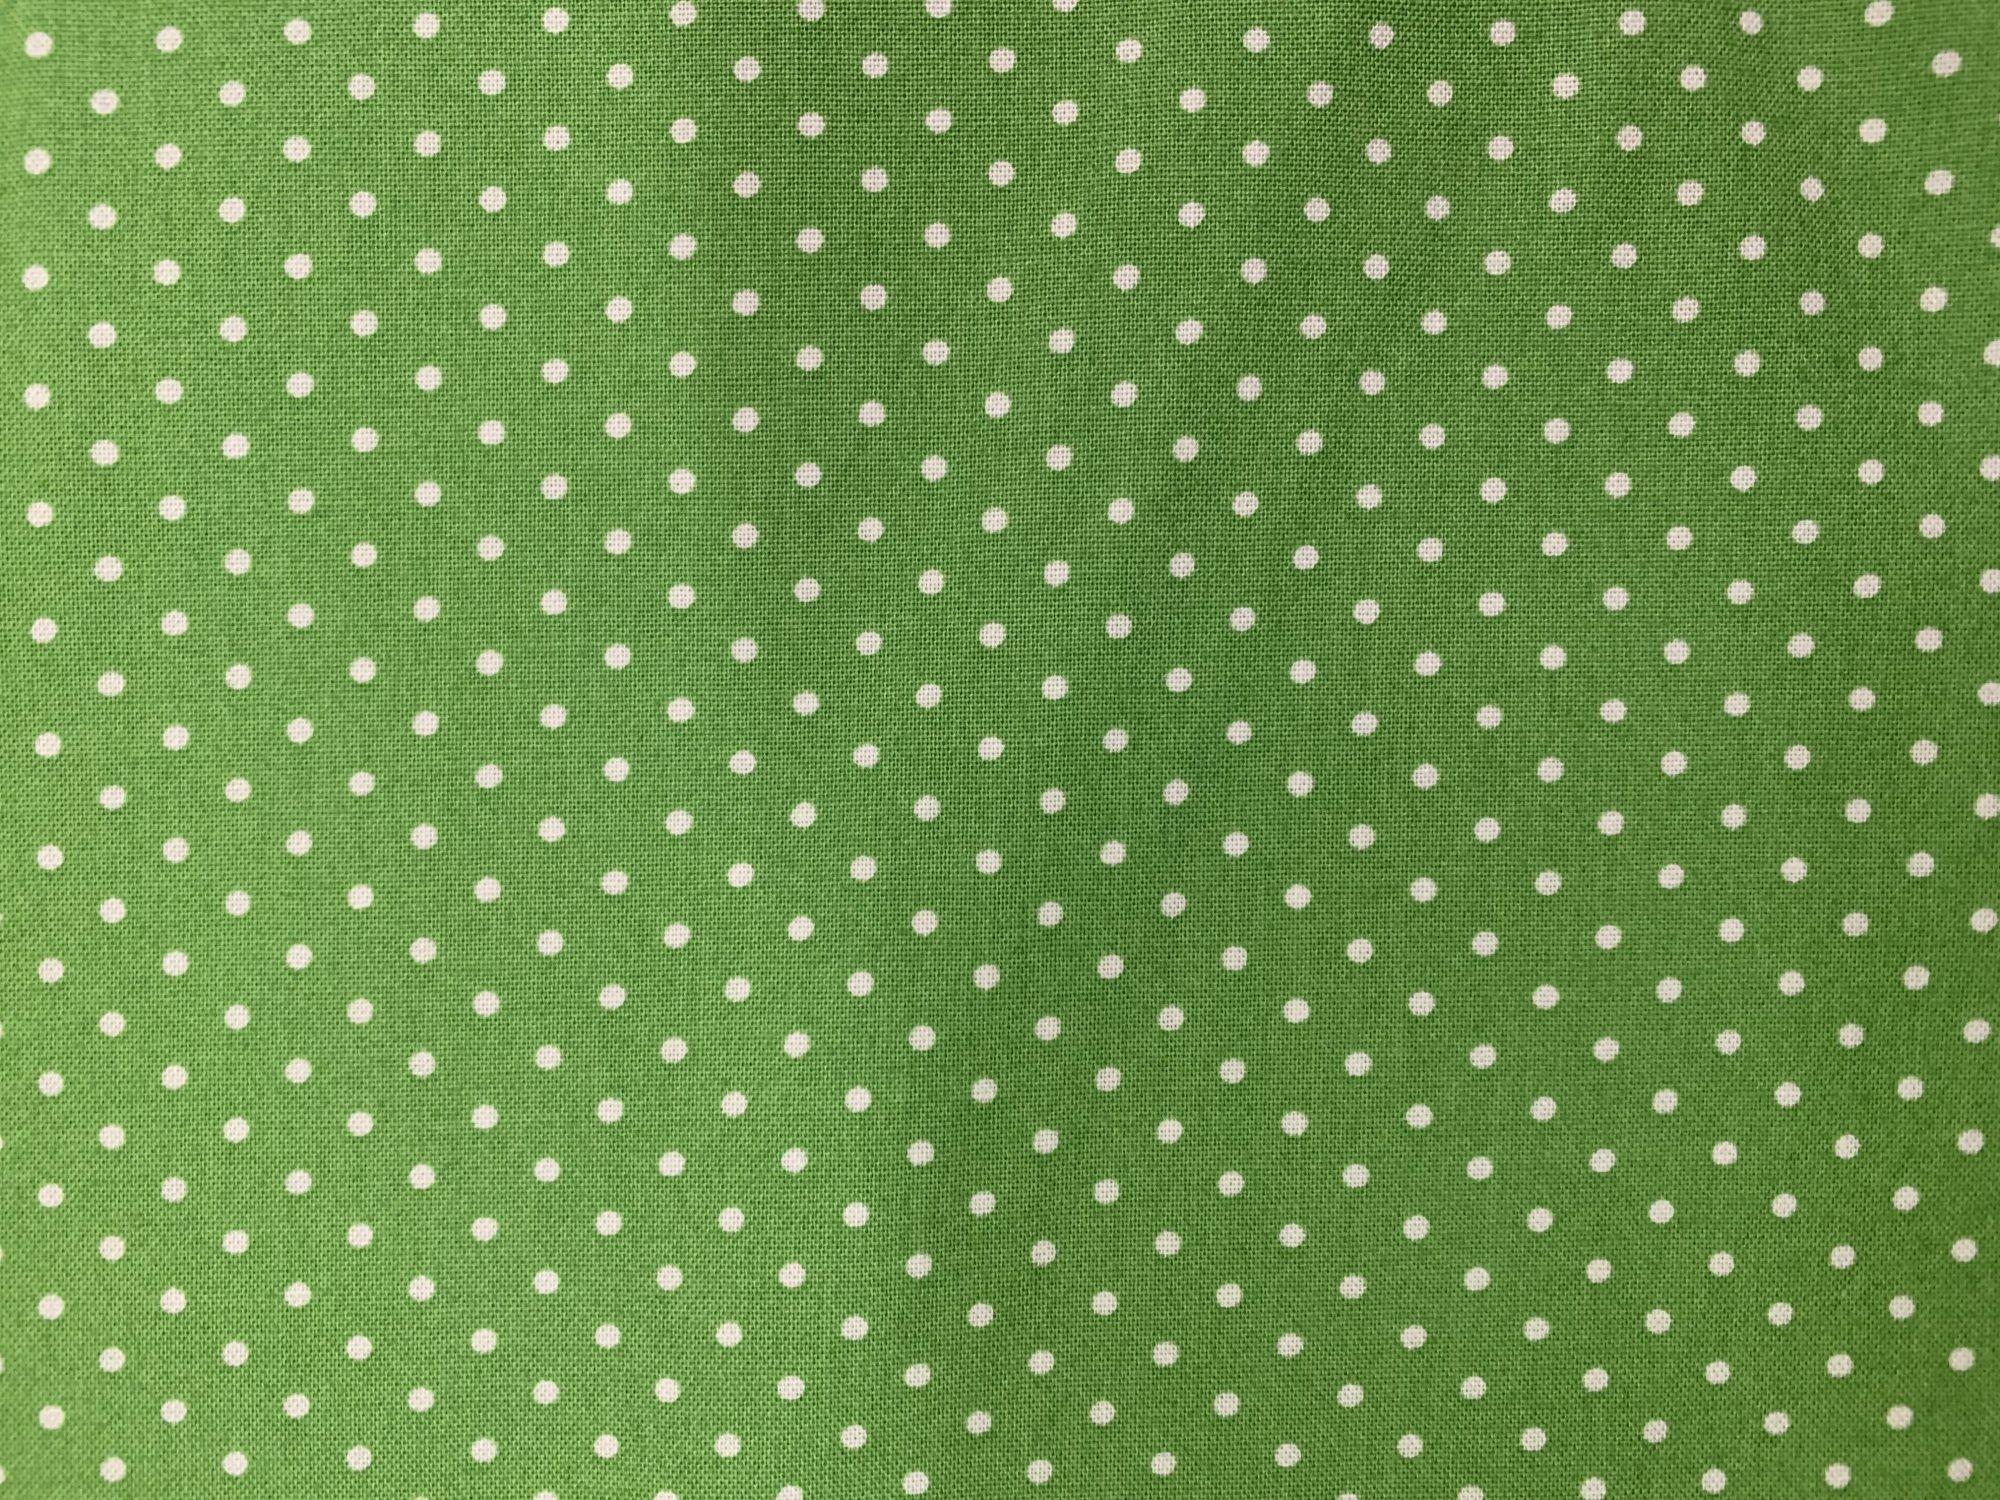 Lake House - Leaf (Dots)